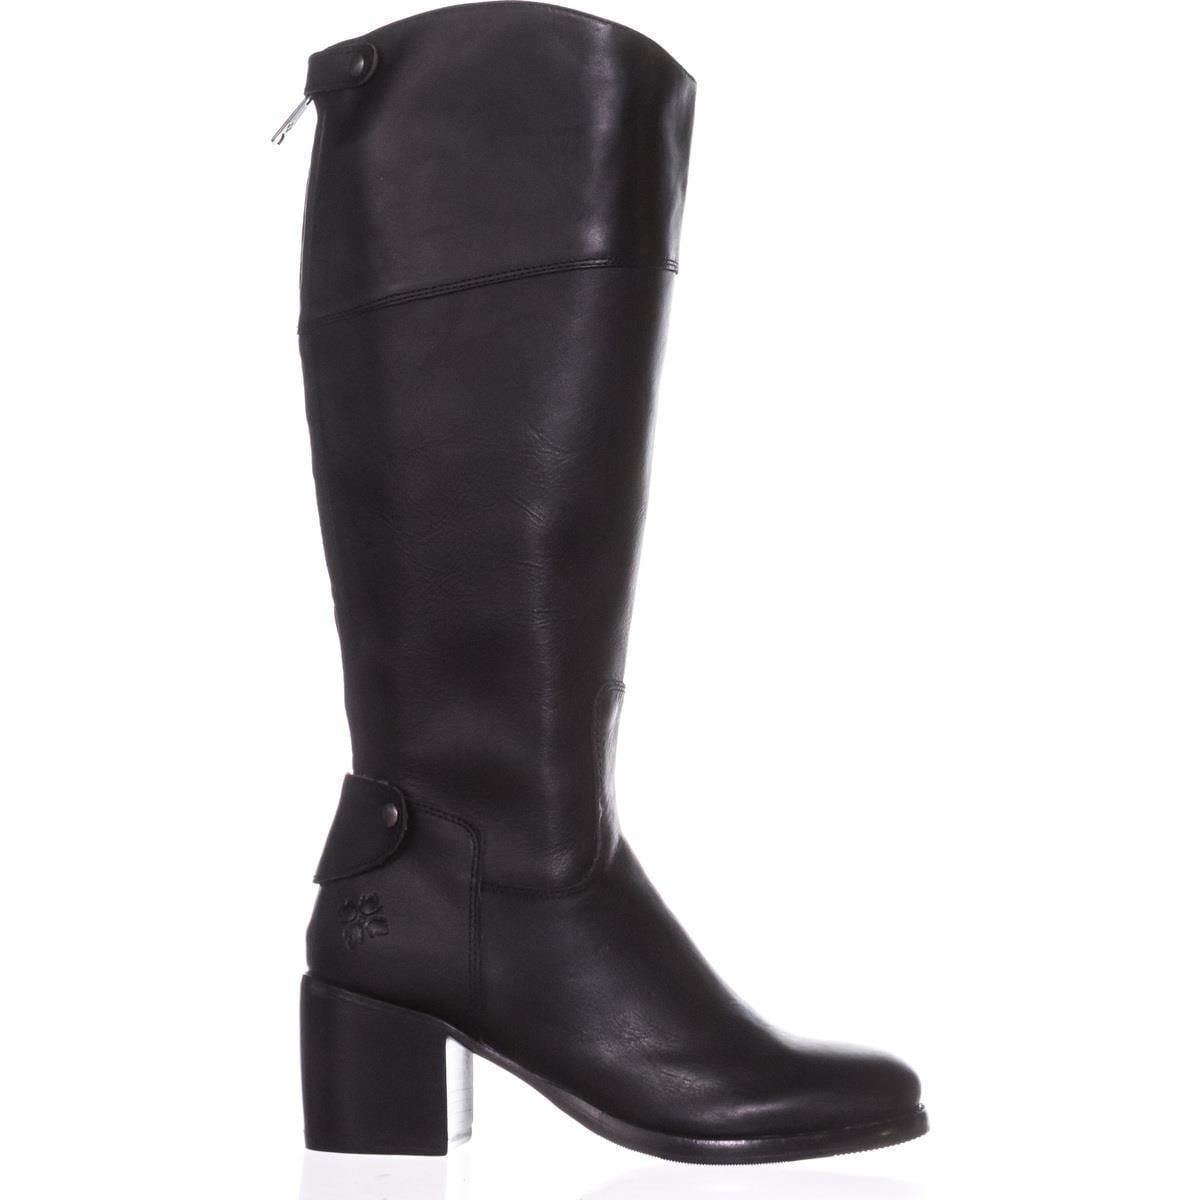 febbb382f8d Patricia Nash Loretta Wide Calf Riding Boots, Black